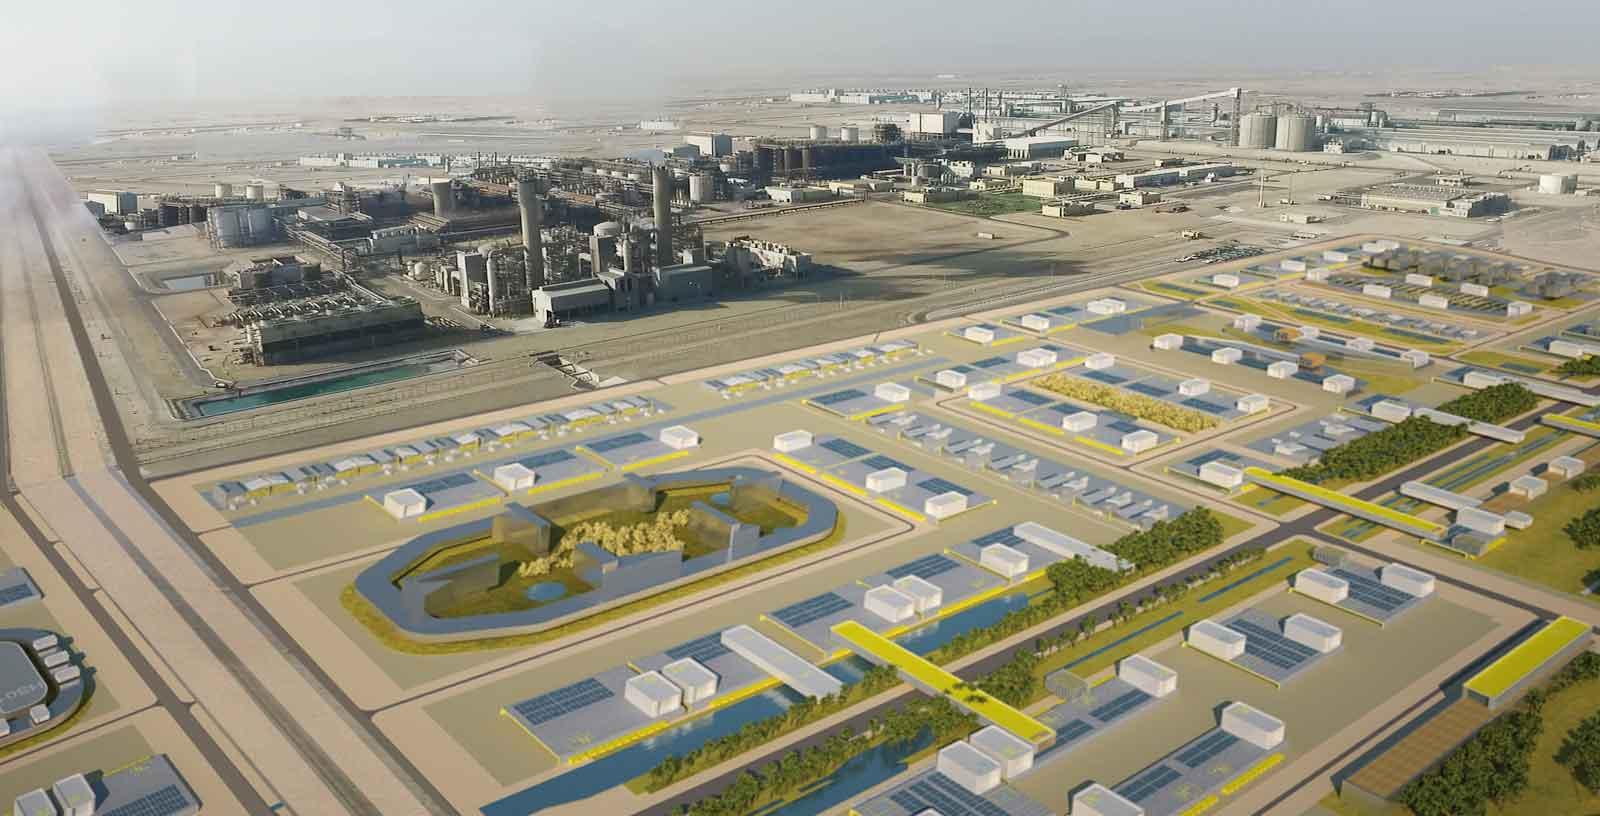 IDOM_Ras Al Khair Industrial City Marketing Study 1